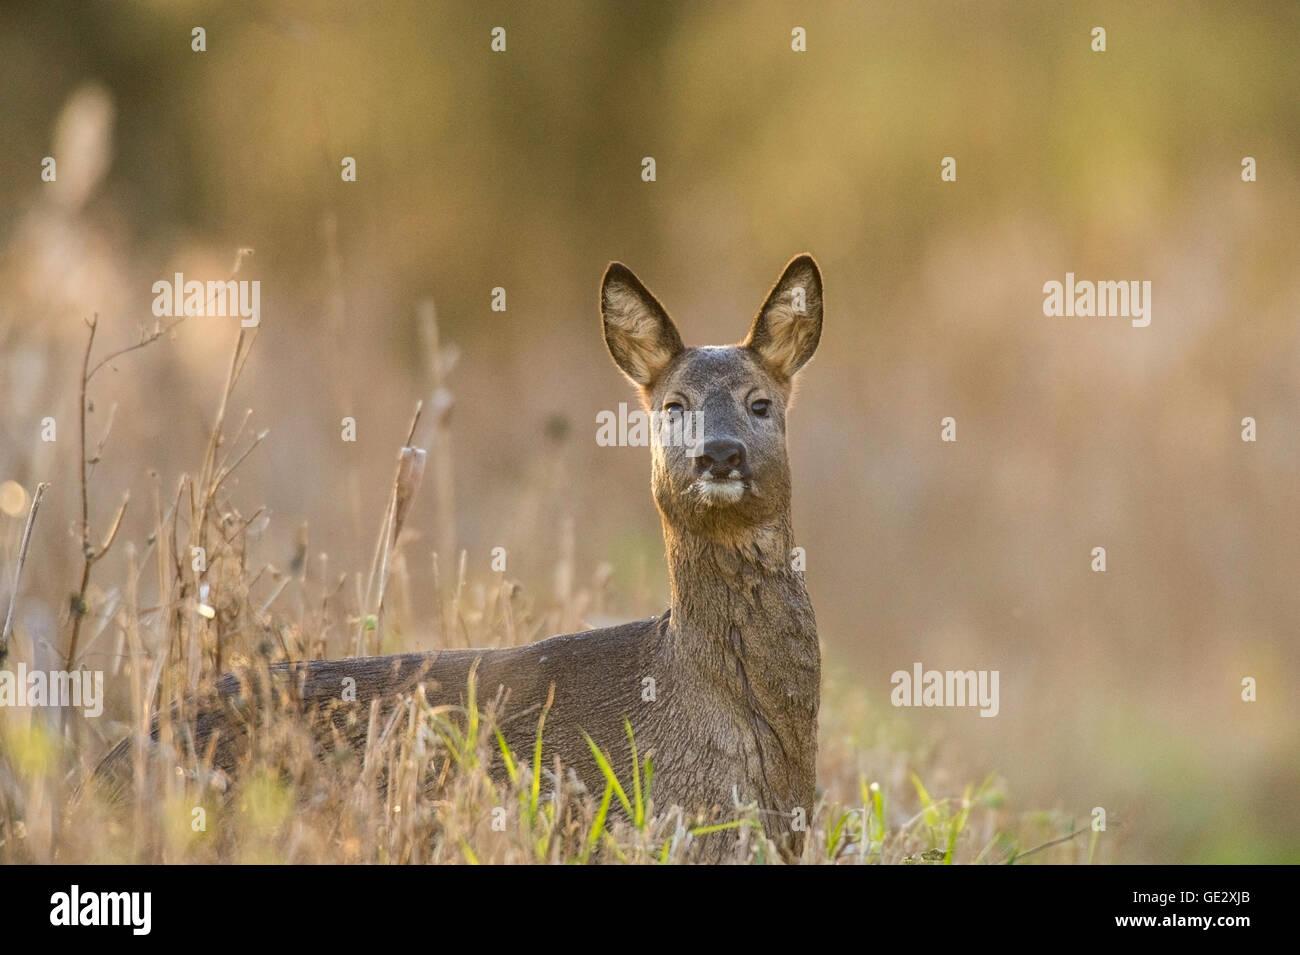 Roe Deer Doe staring at the camera. - Stock Image